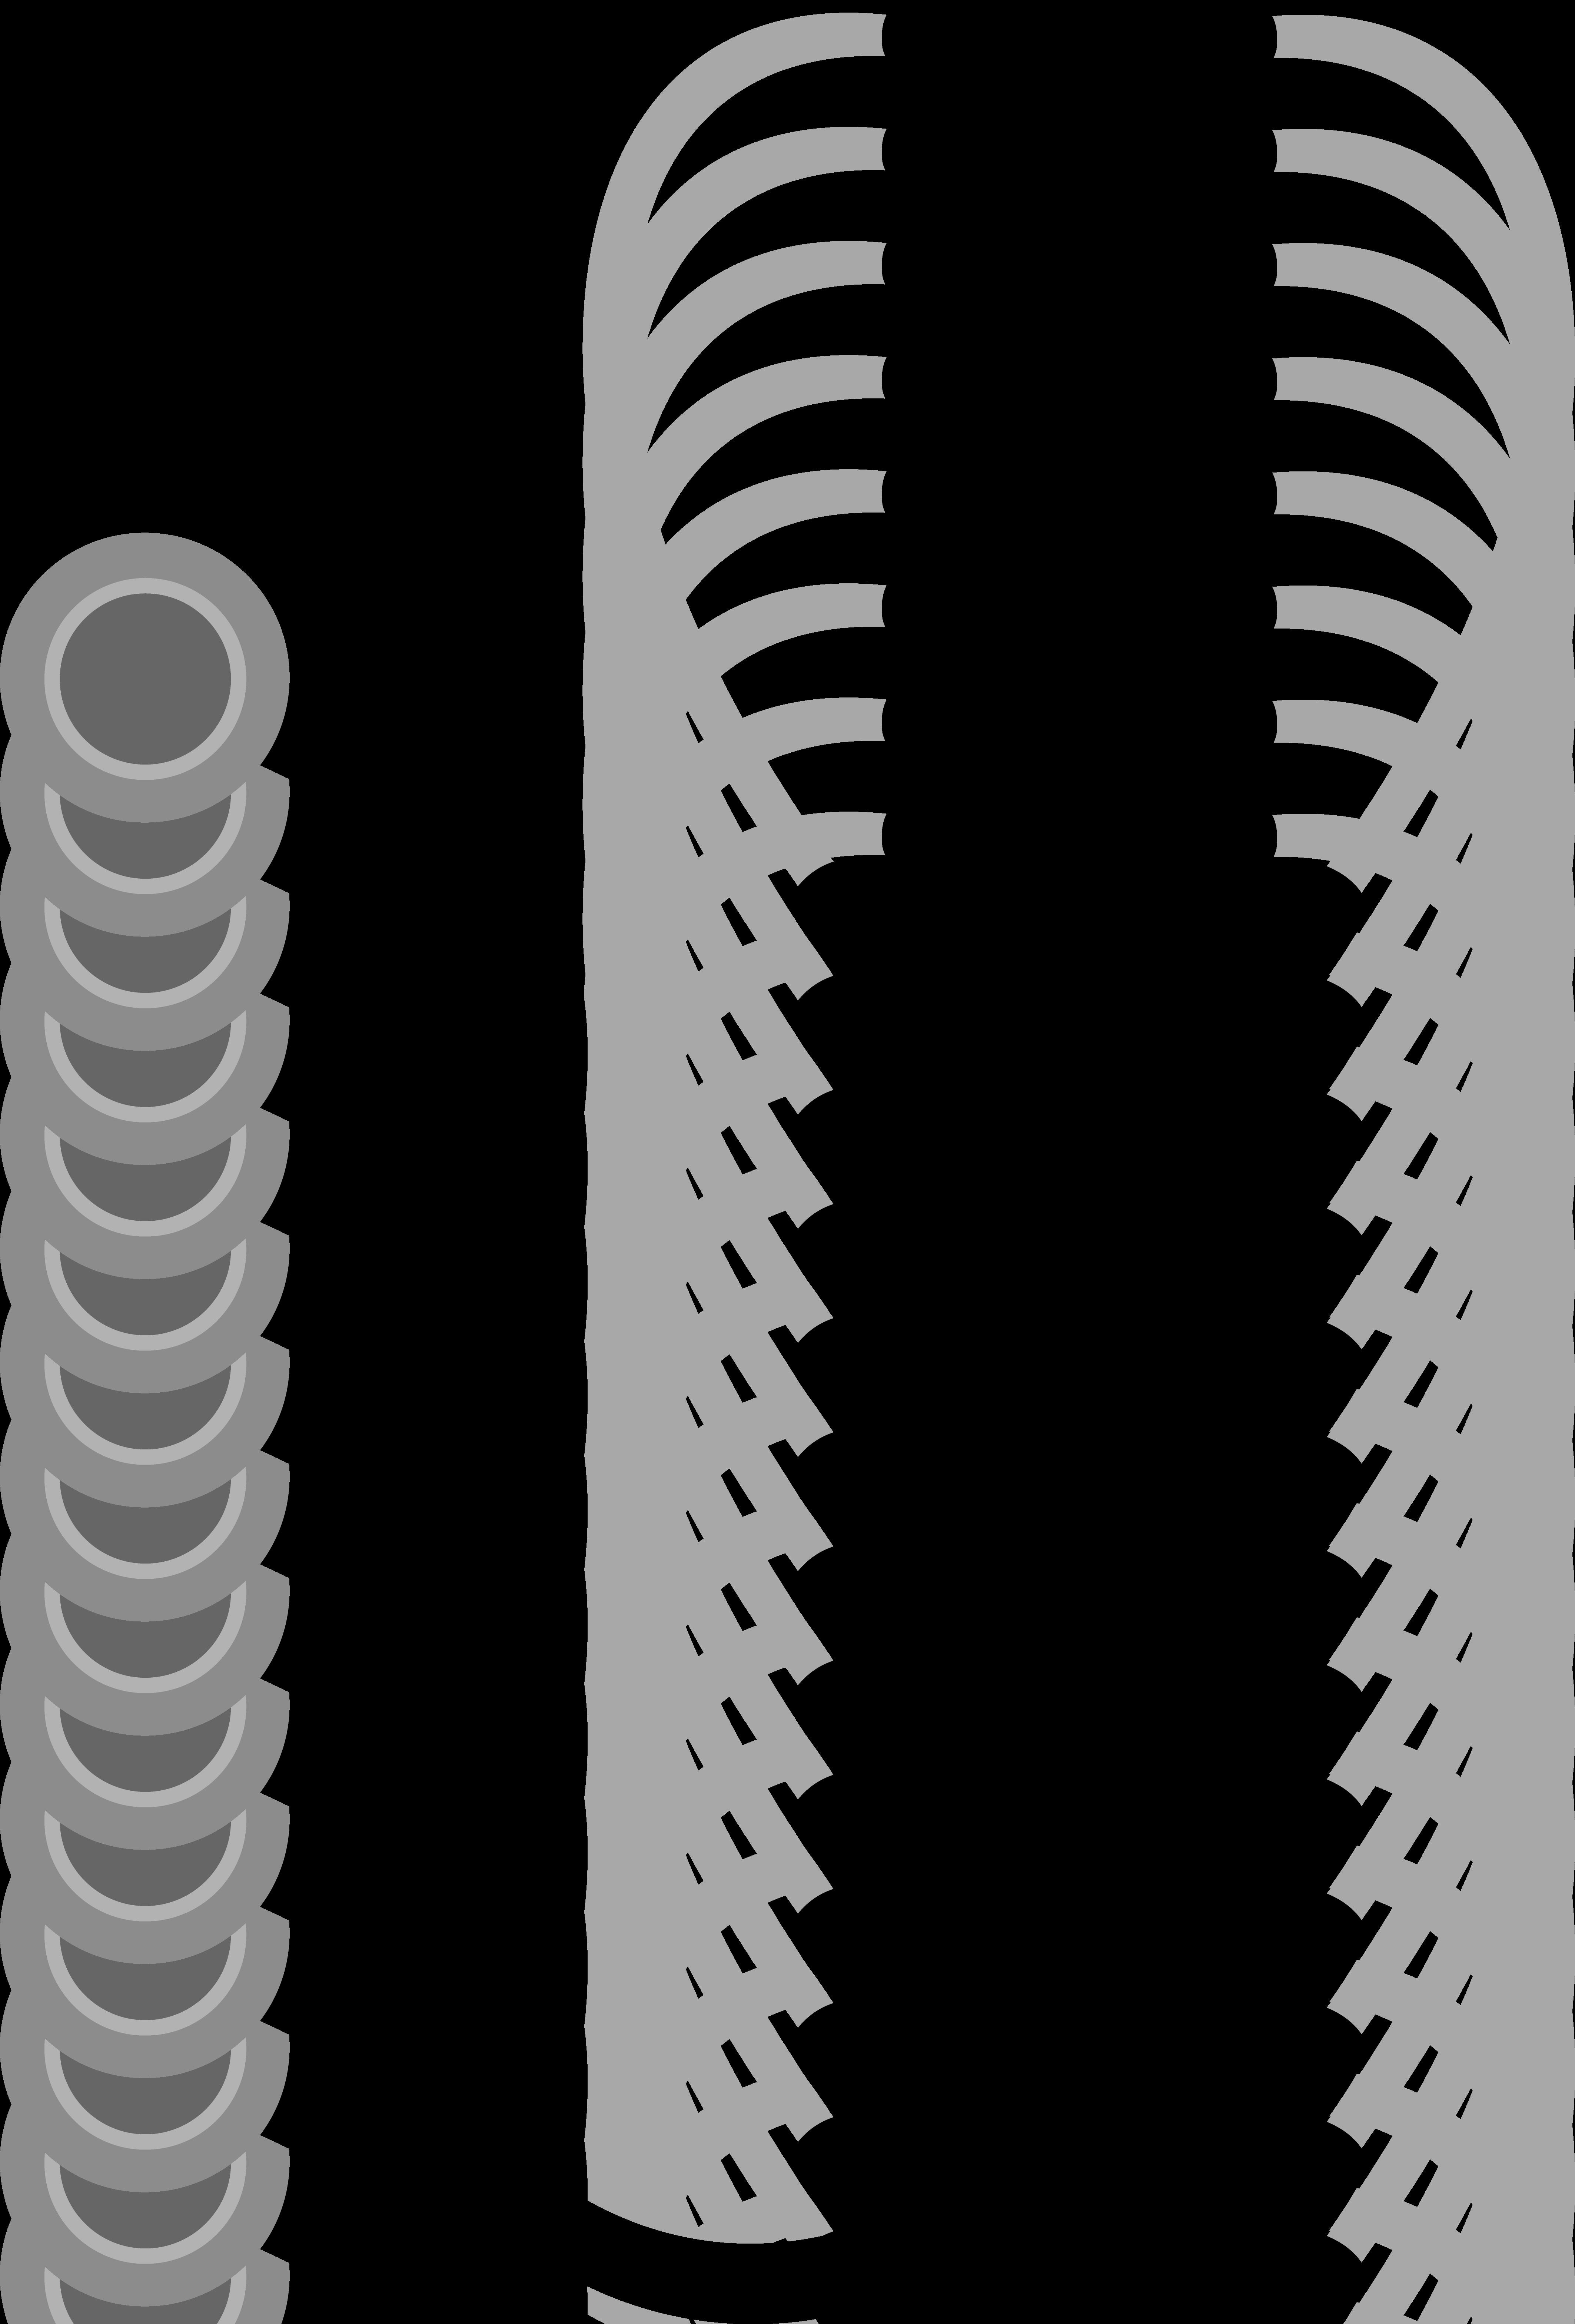 4251x6271 Human Body Silhouette Clipart